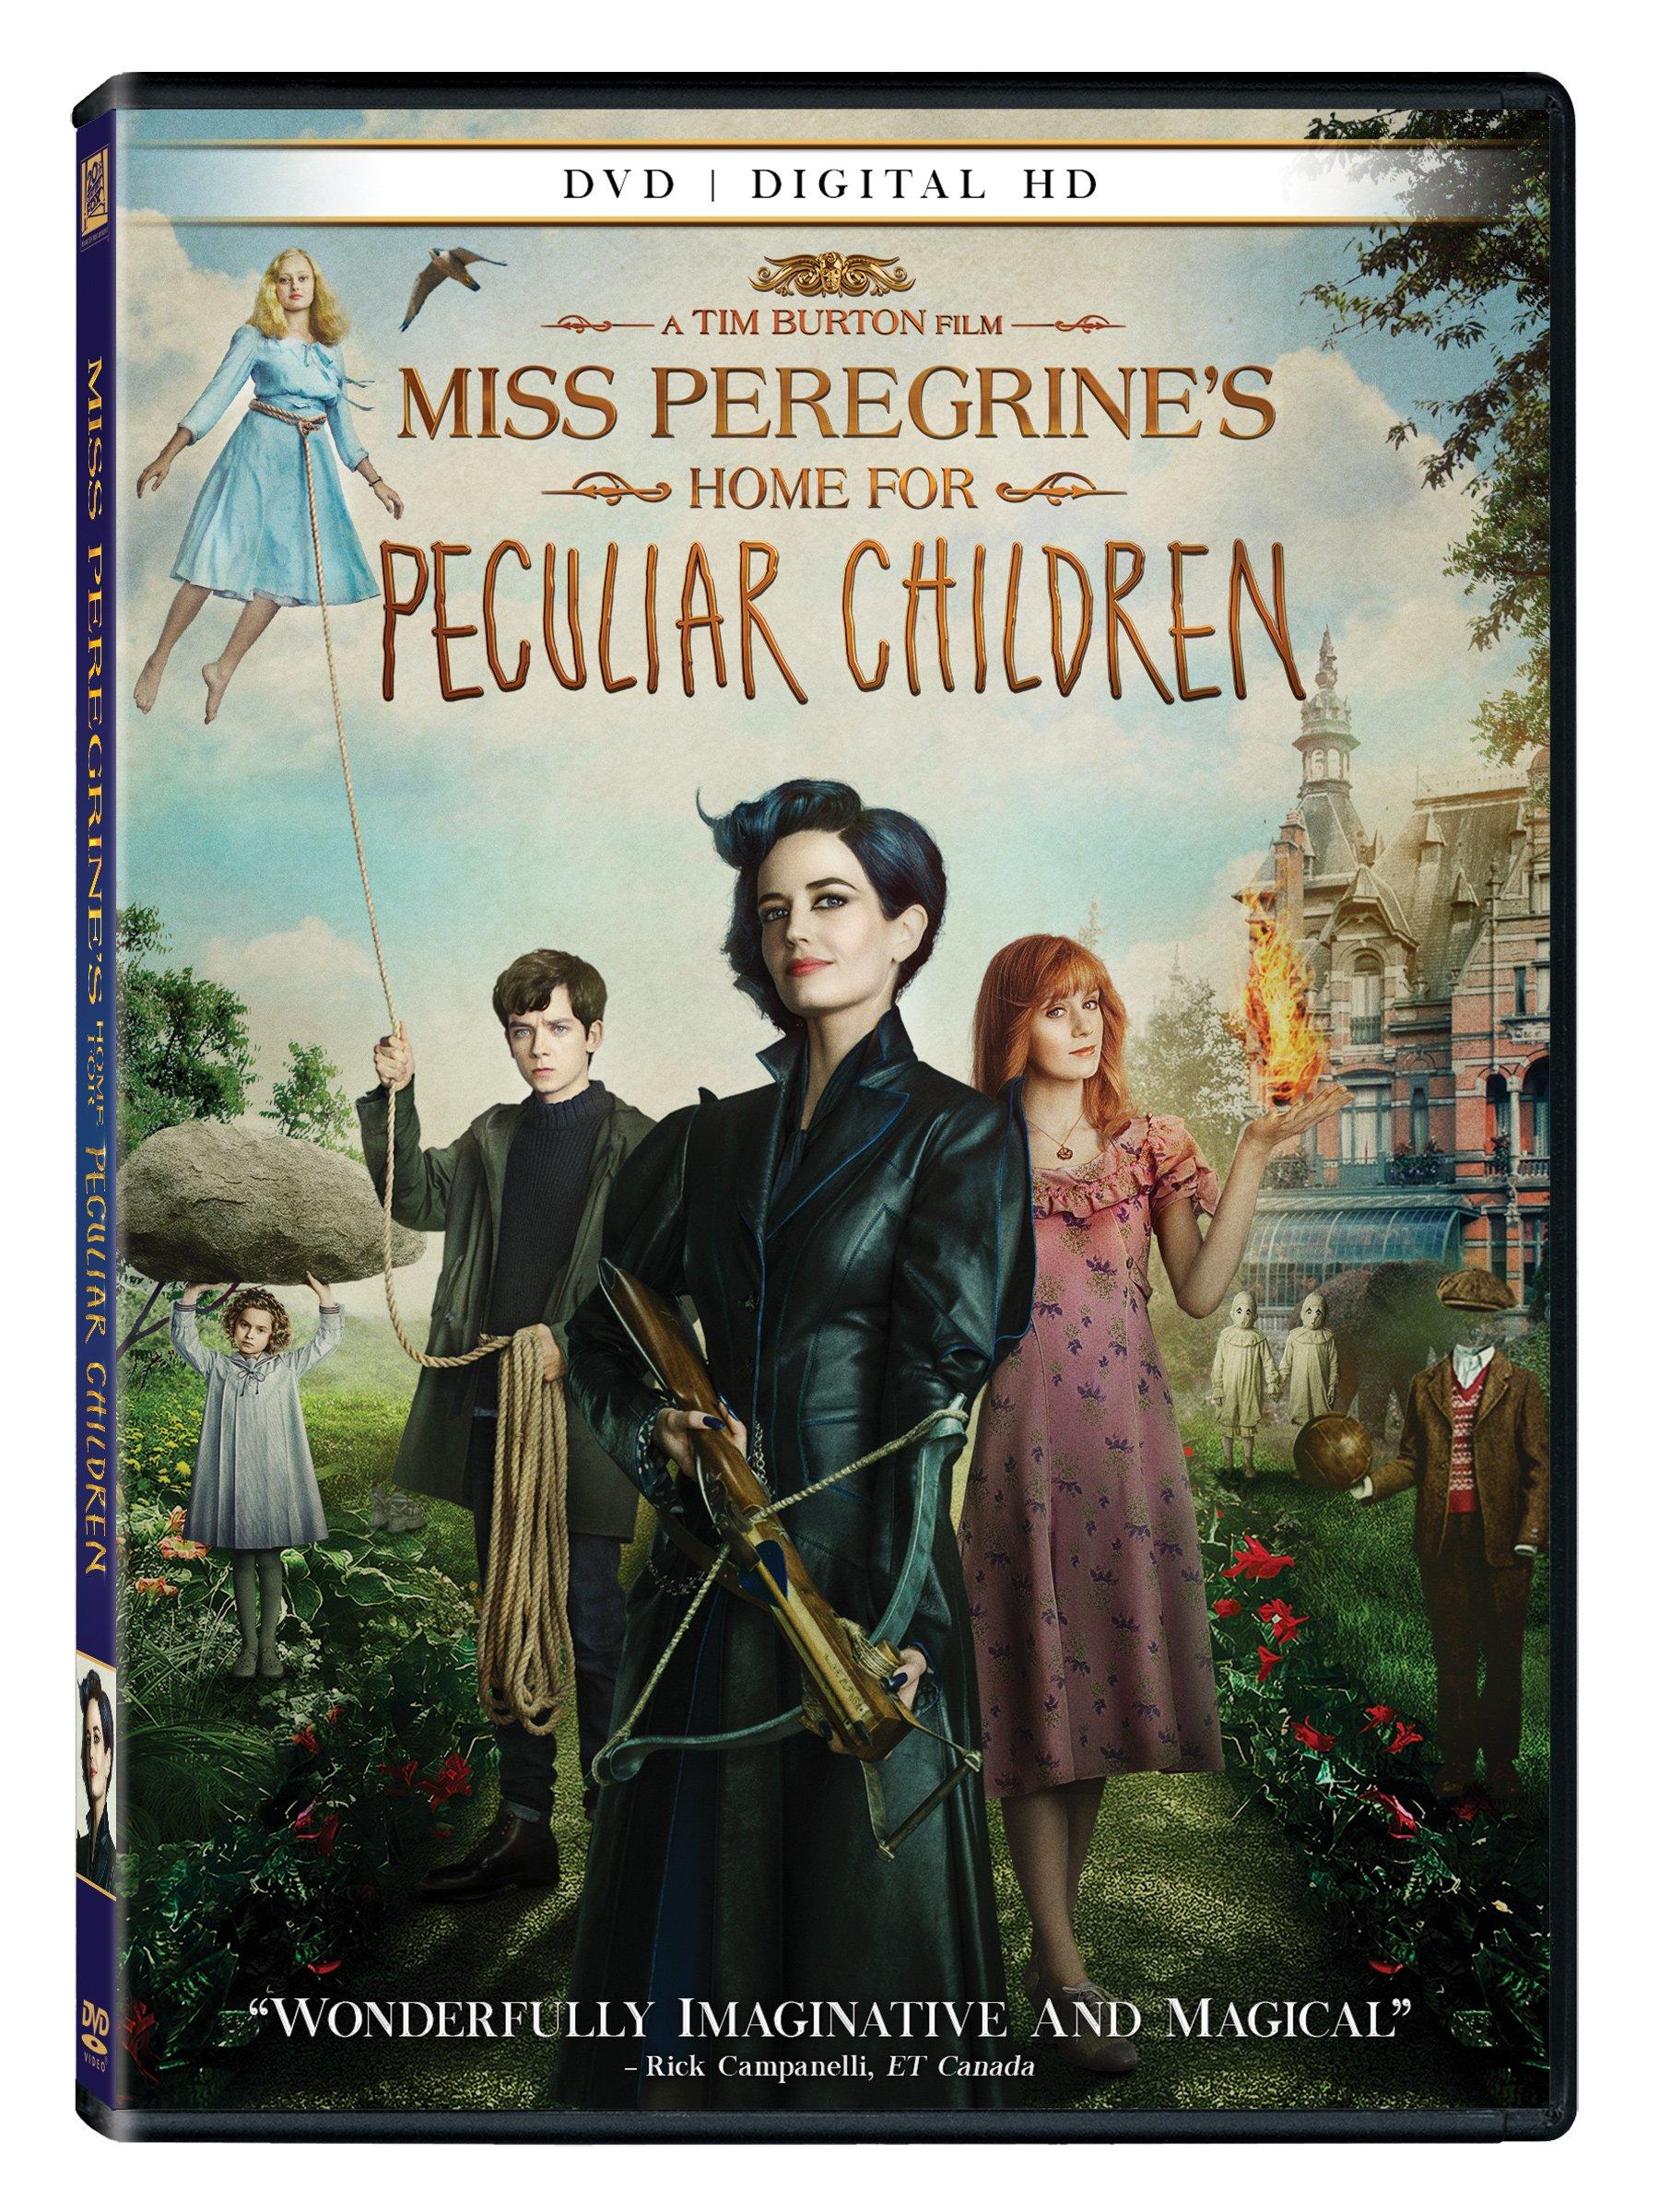 Buy Miss Peregrine Peculiar Children Now!